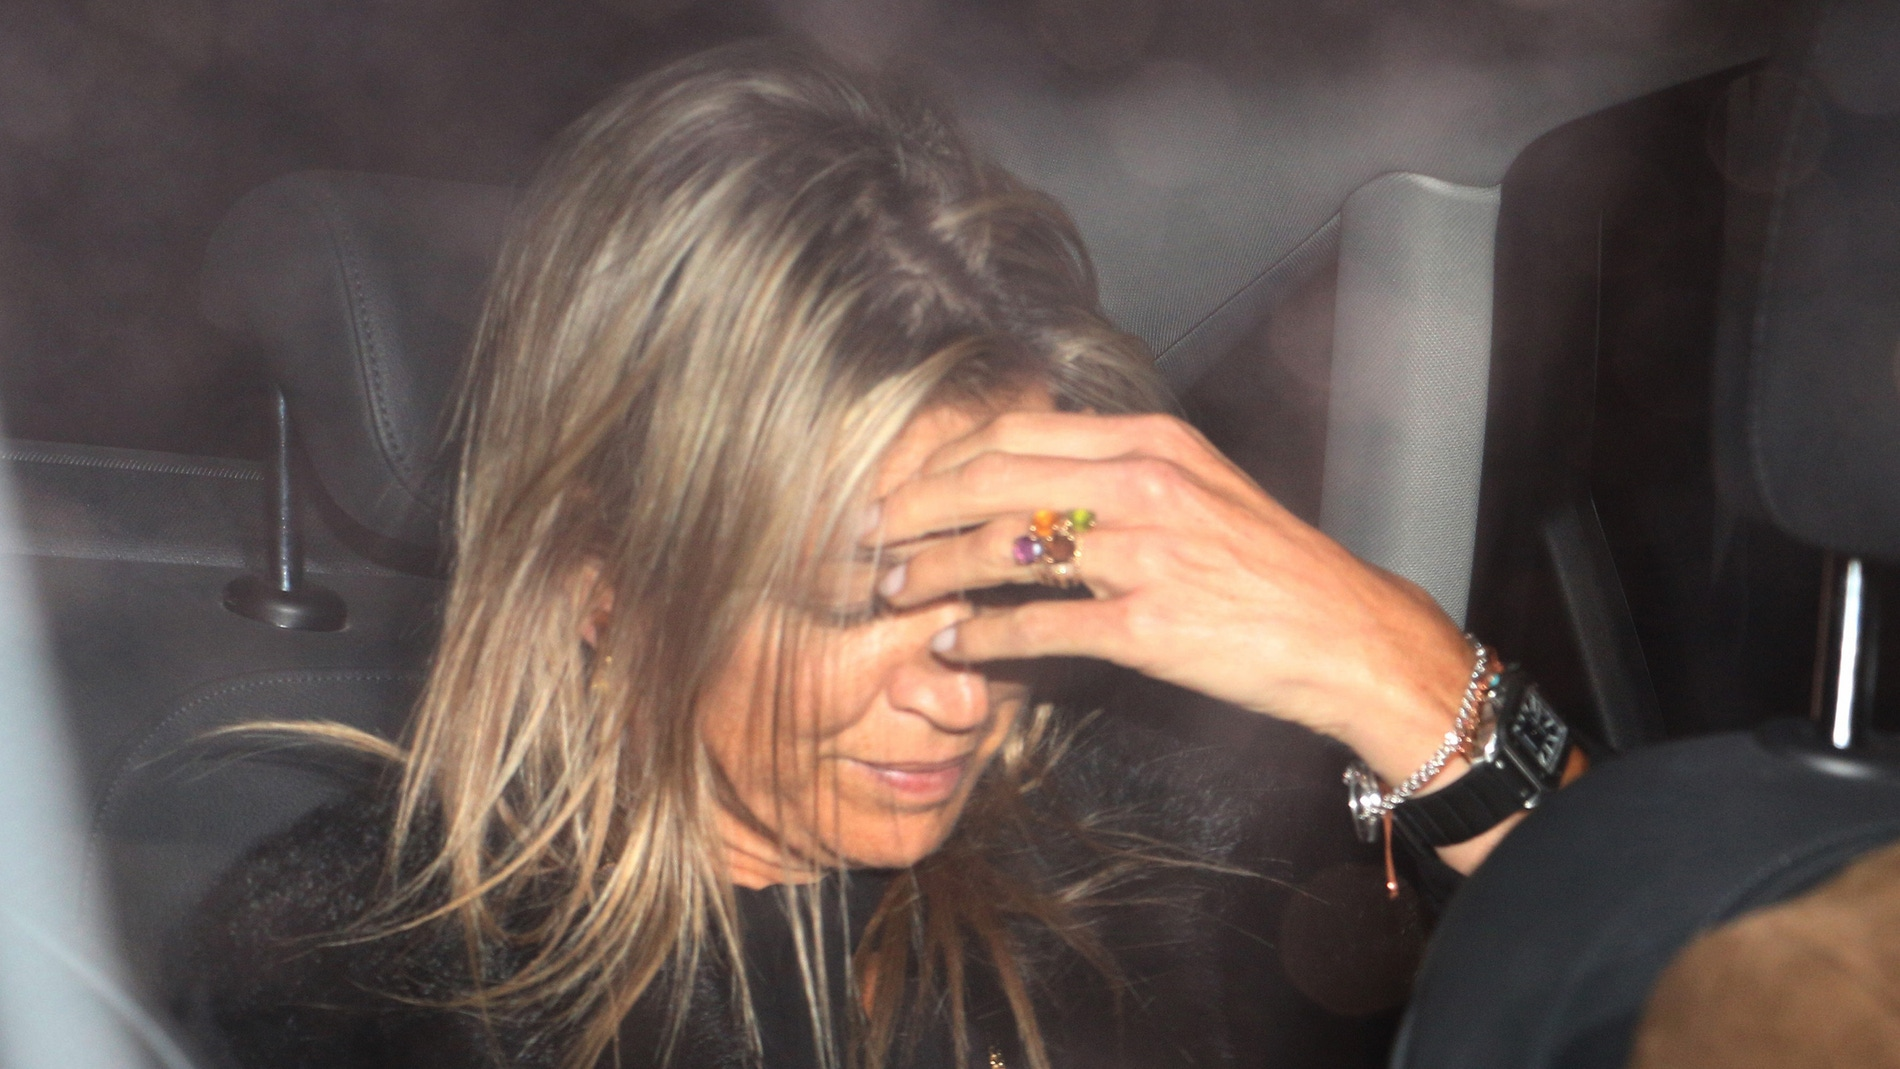 Máxima de Holanda, destrozada por la muerte de su padre Jorge Zorreguieta